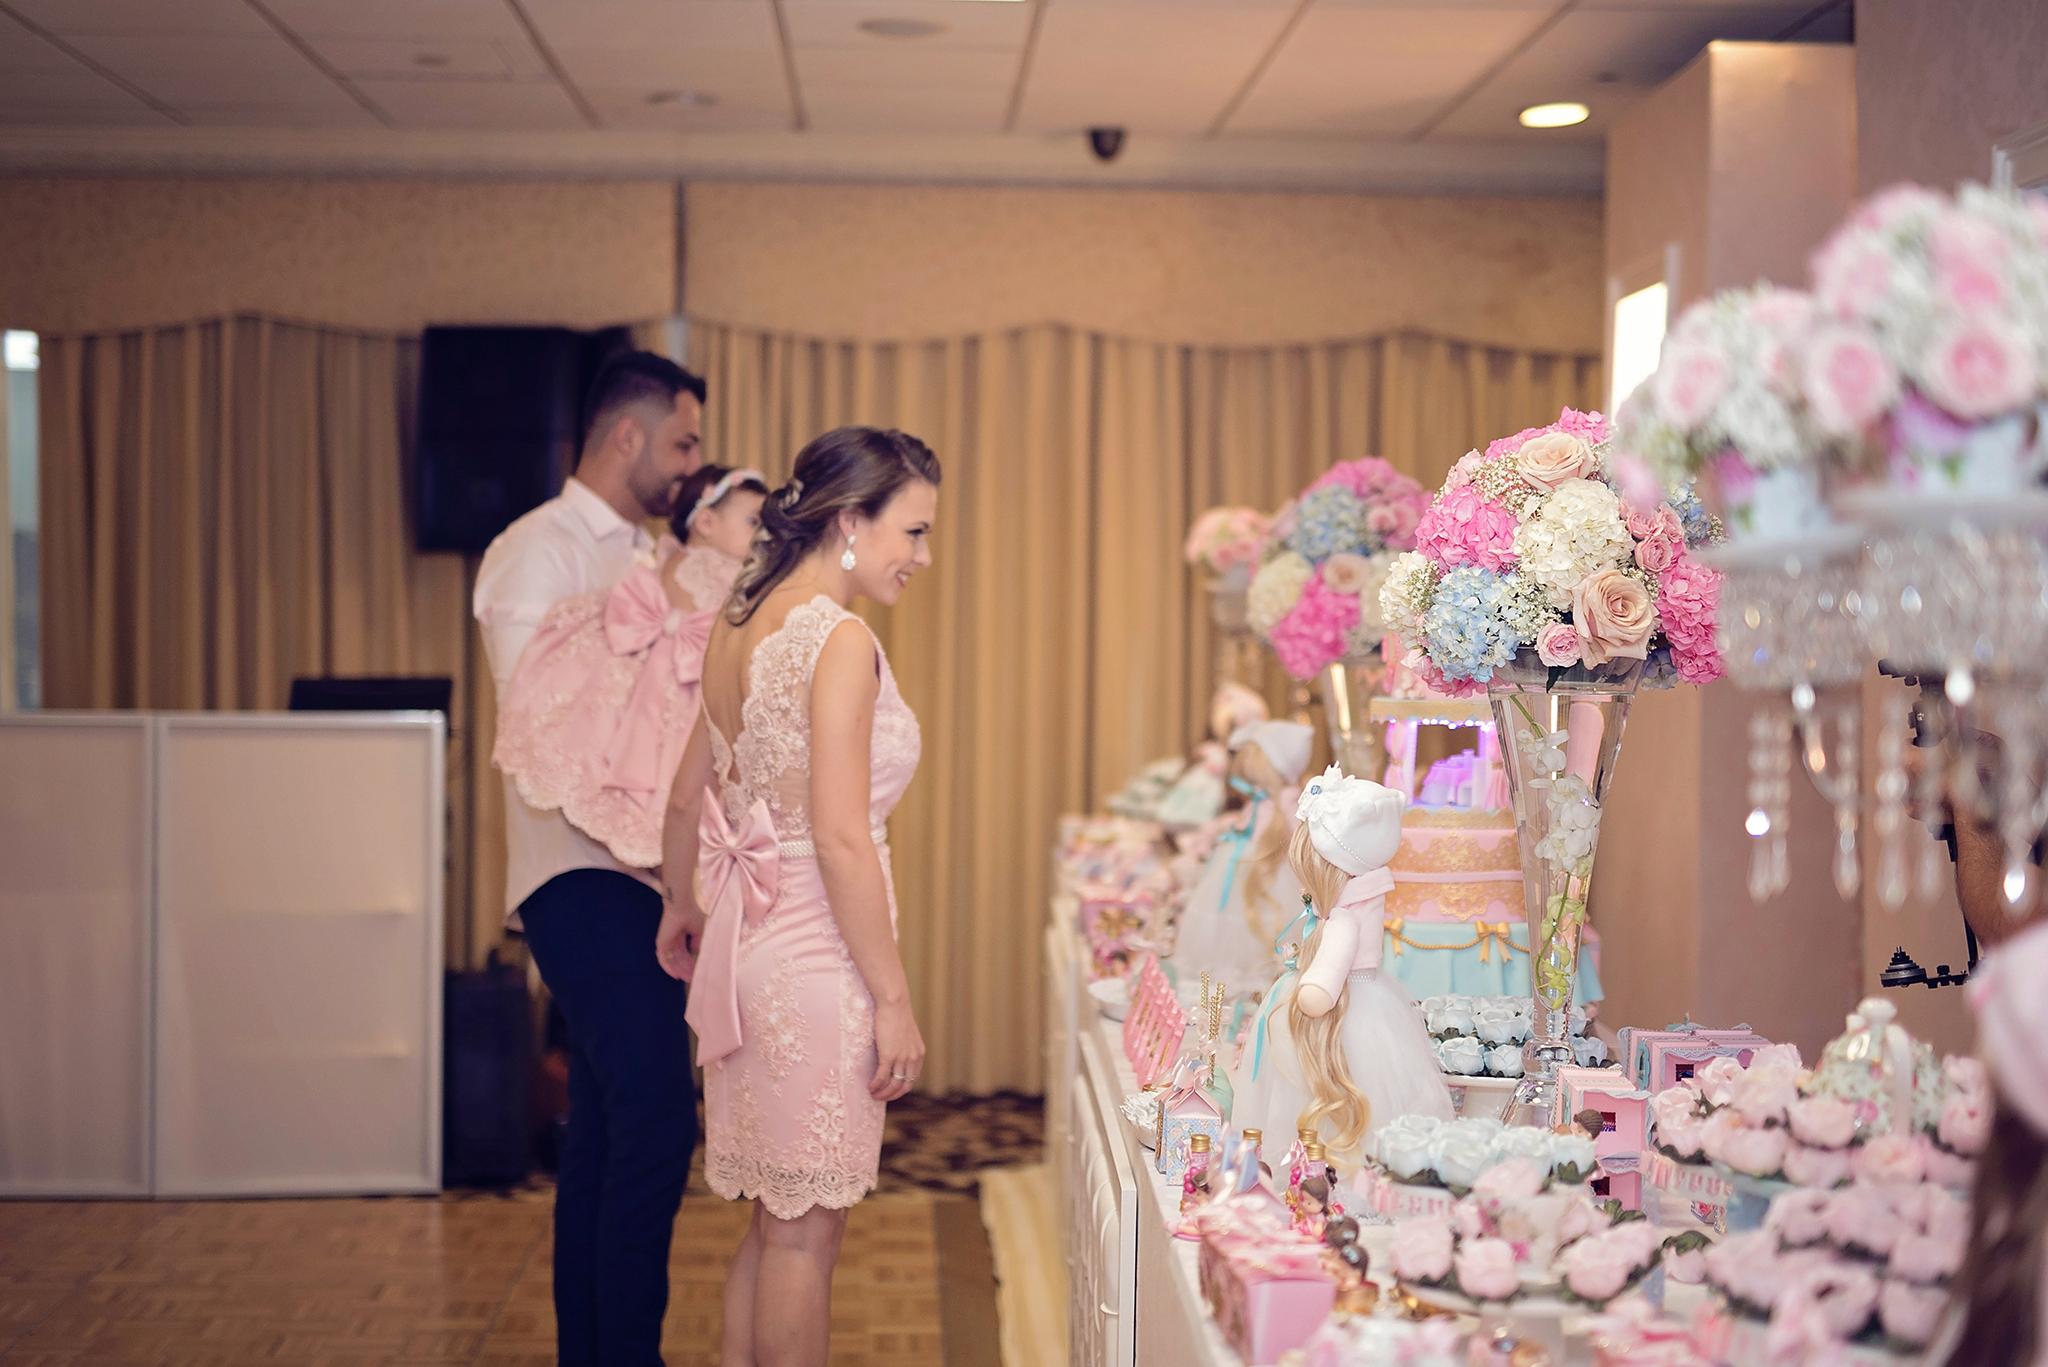 NJ-NY-cakesmash-birthday-Photographer-026.JPG